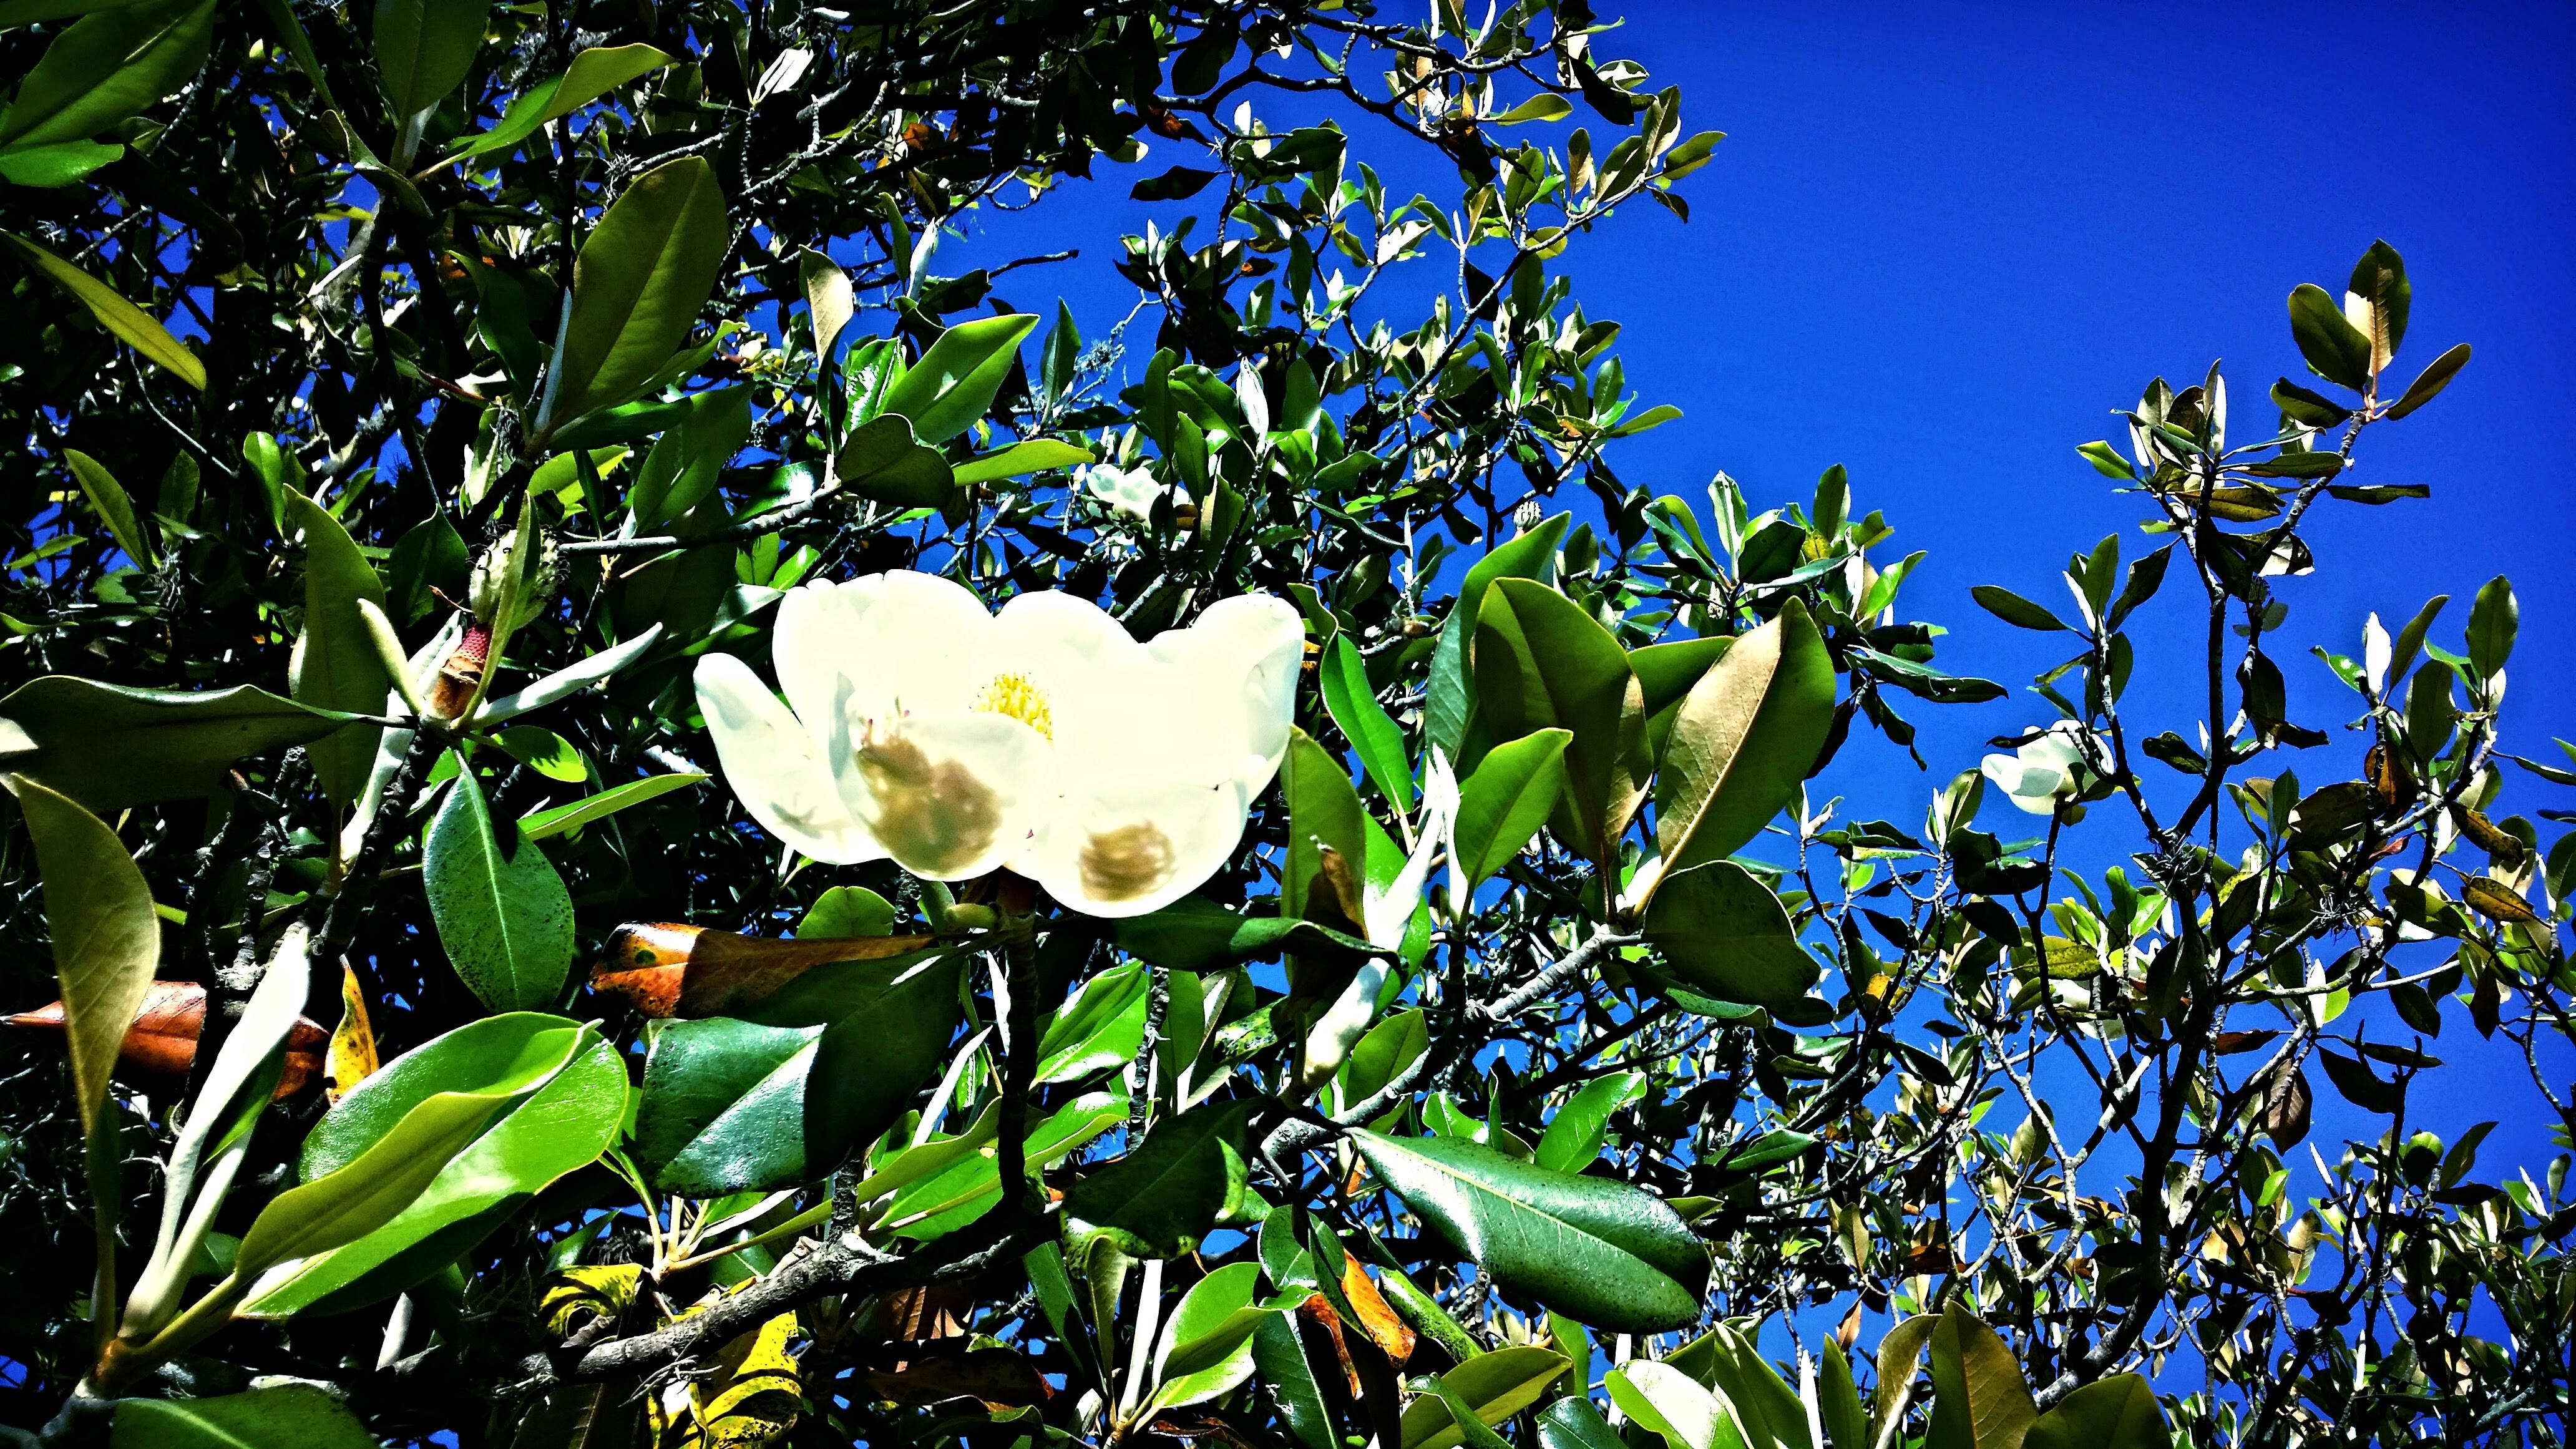 Magnolia tree in front of St. Bart's Hempstead